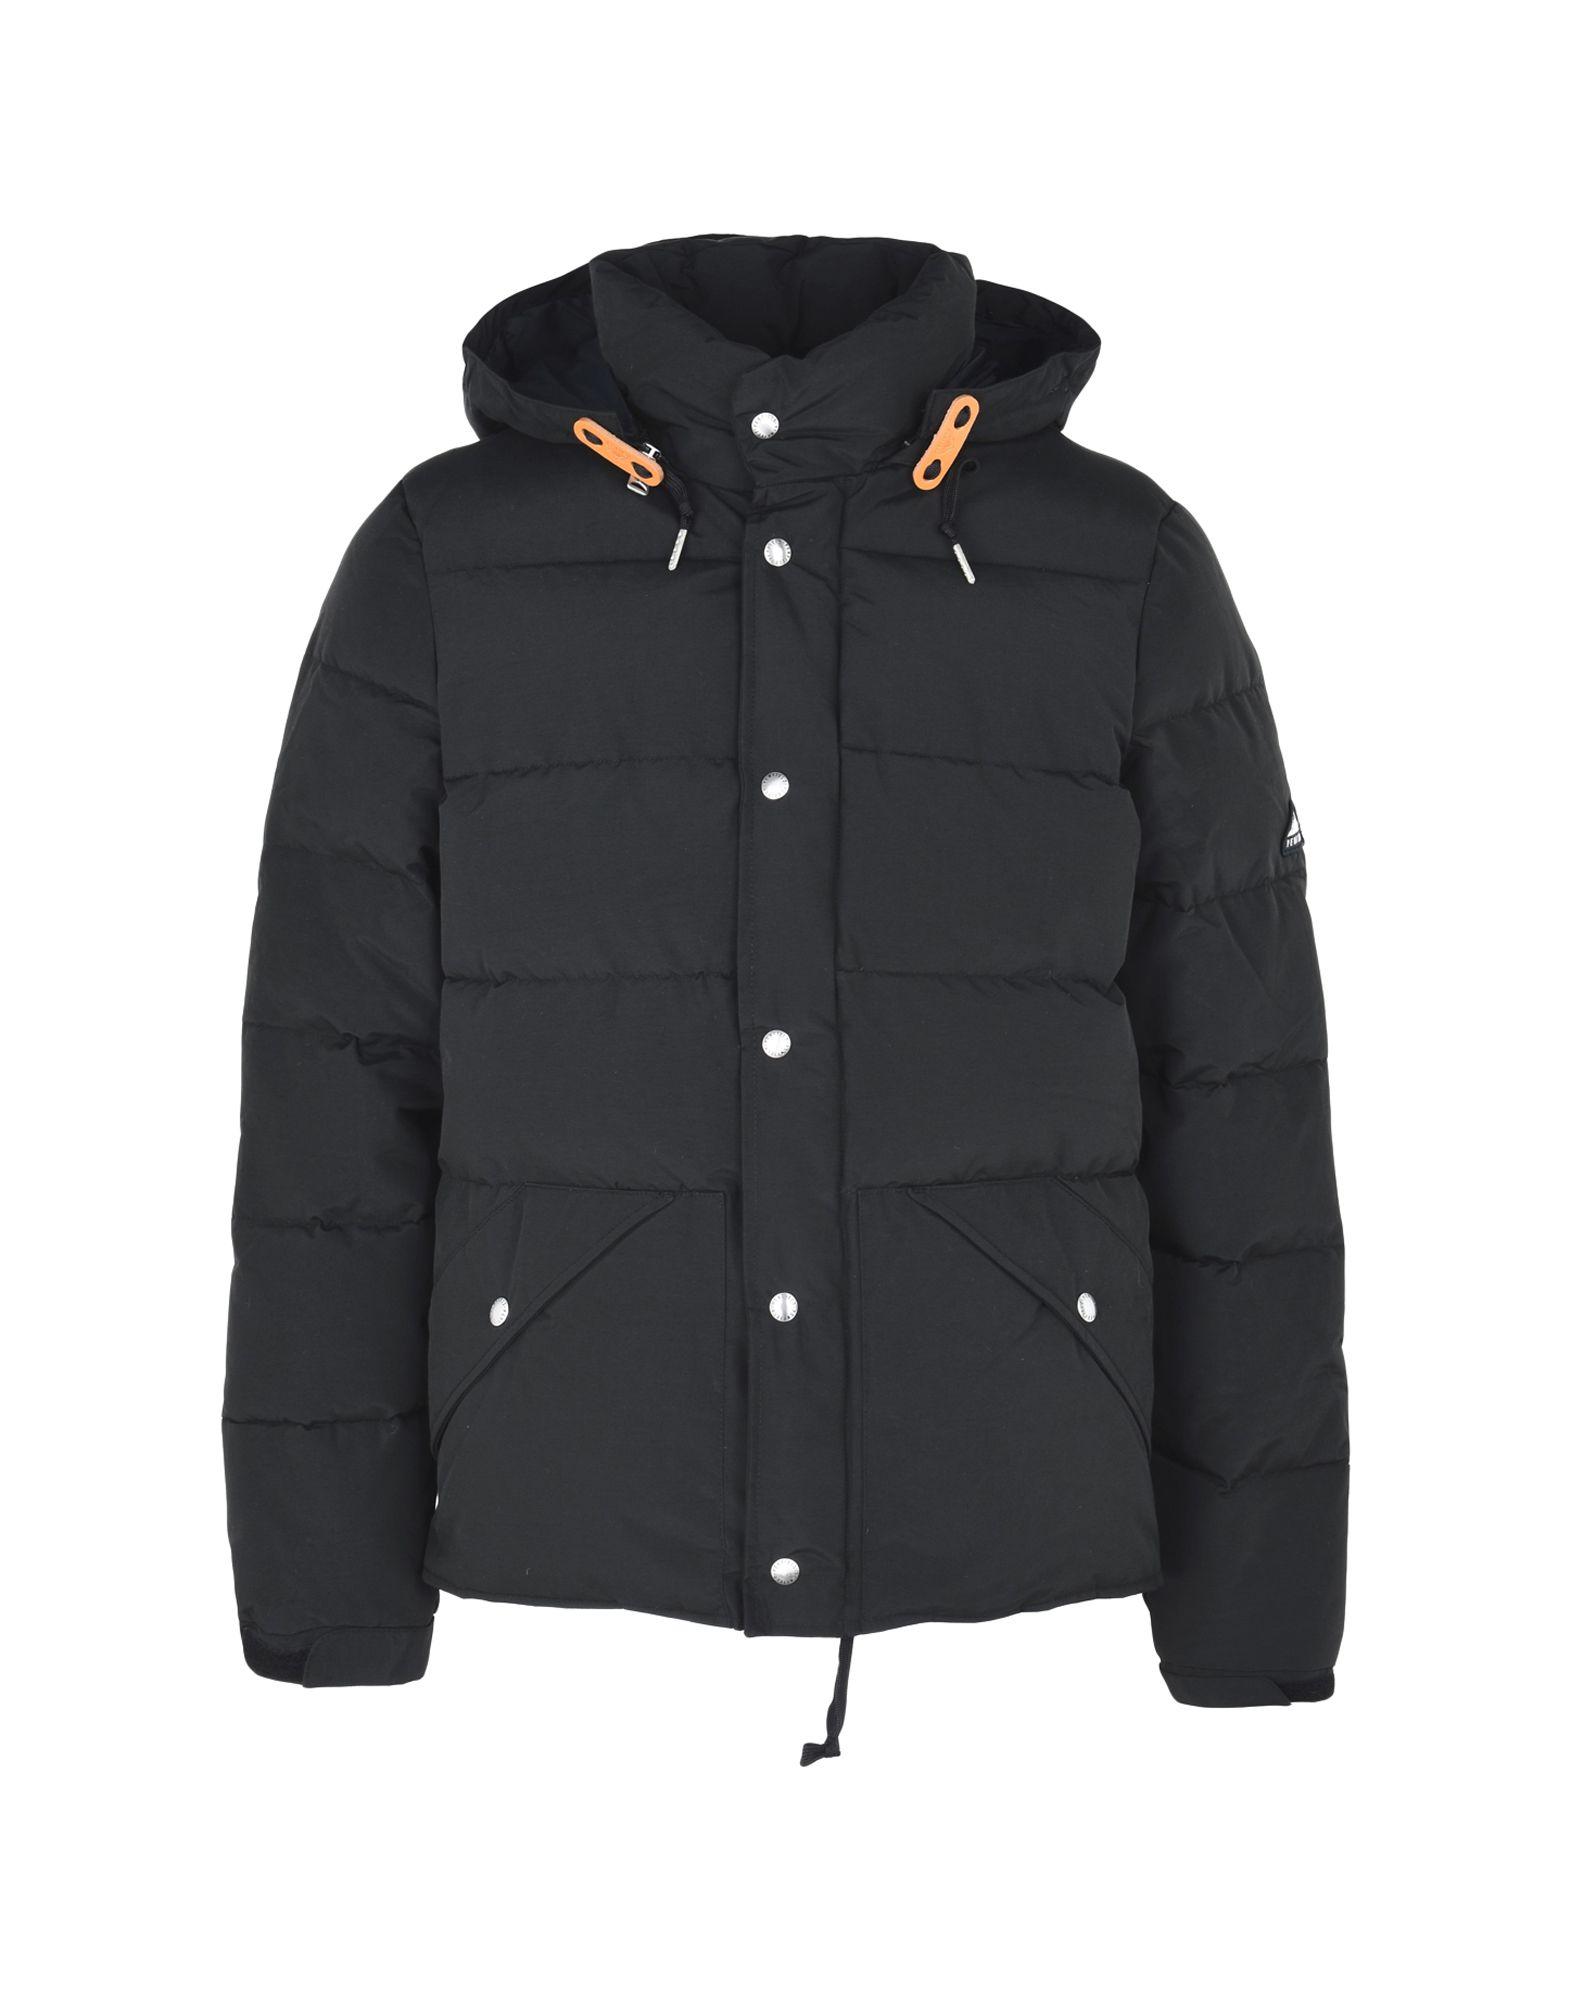 Piumino Penfield Bowerbridge Iconic Down Jacket - Uomo - Acquista online su